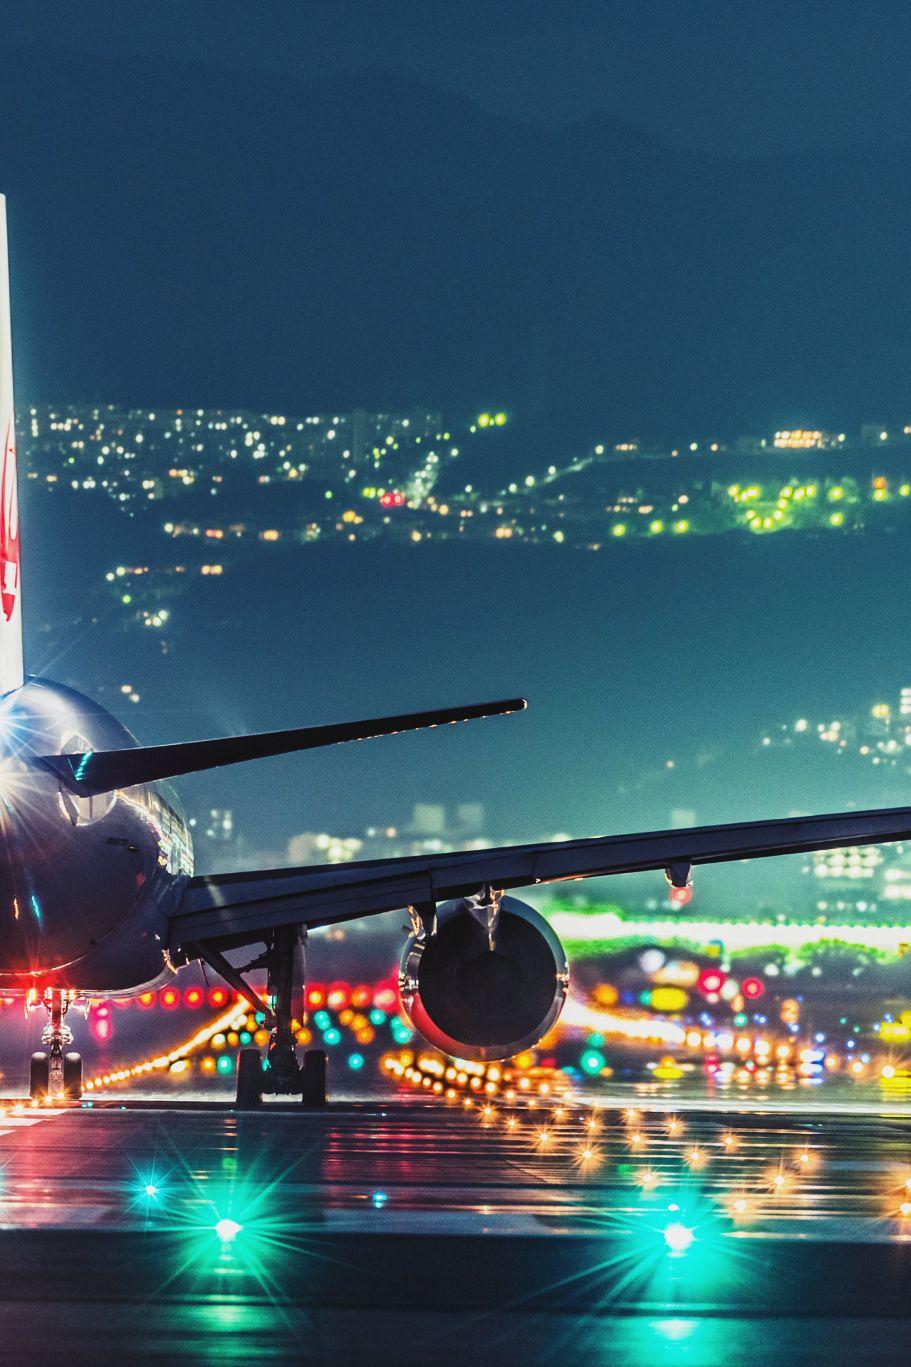 Beautiful Wallpaper Night Airplane - ba205d76d48a19037db08b2a16273f44  Pictures.jpg